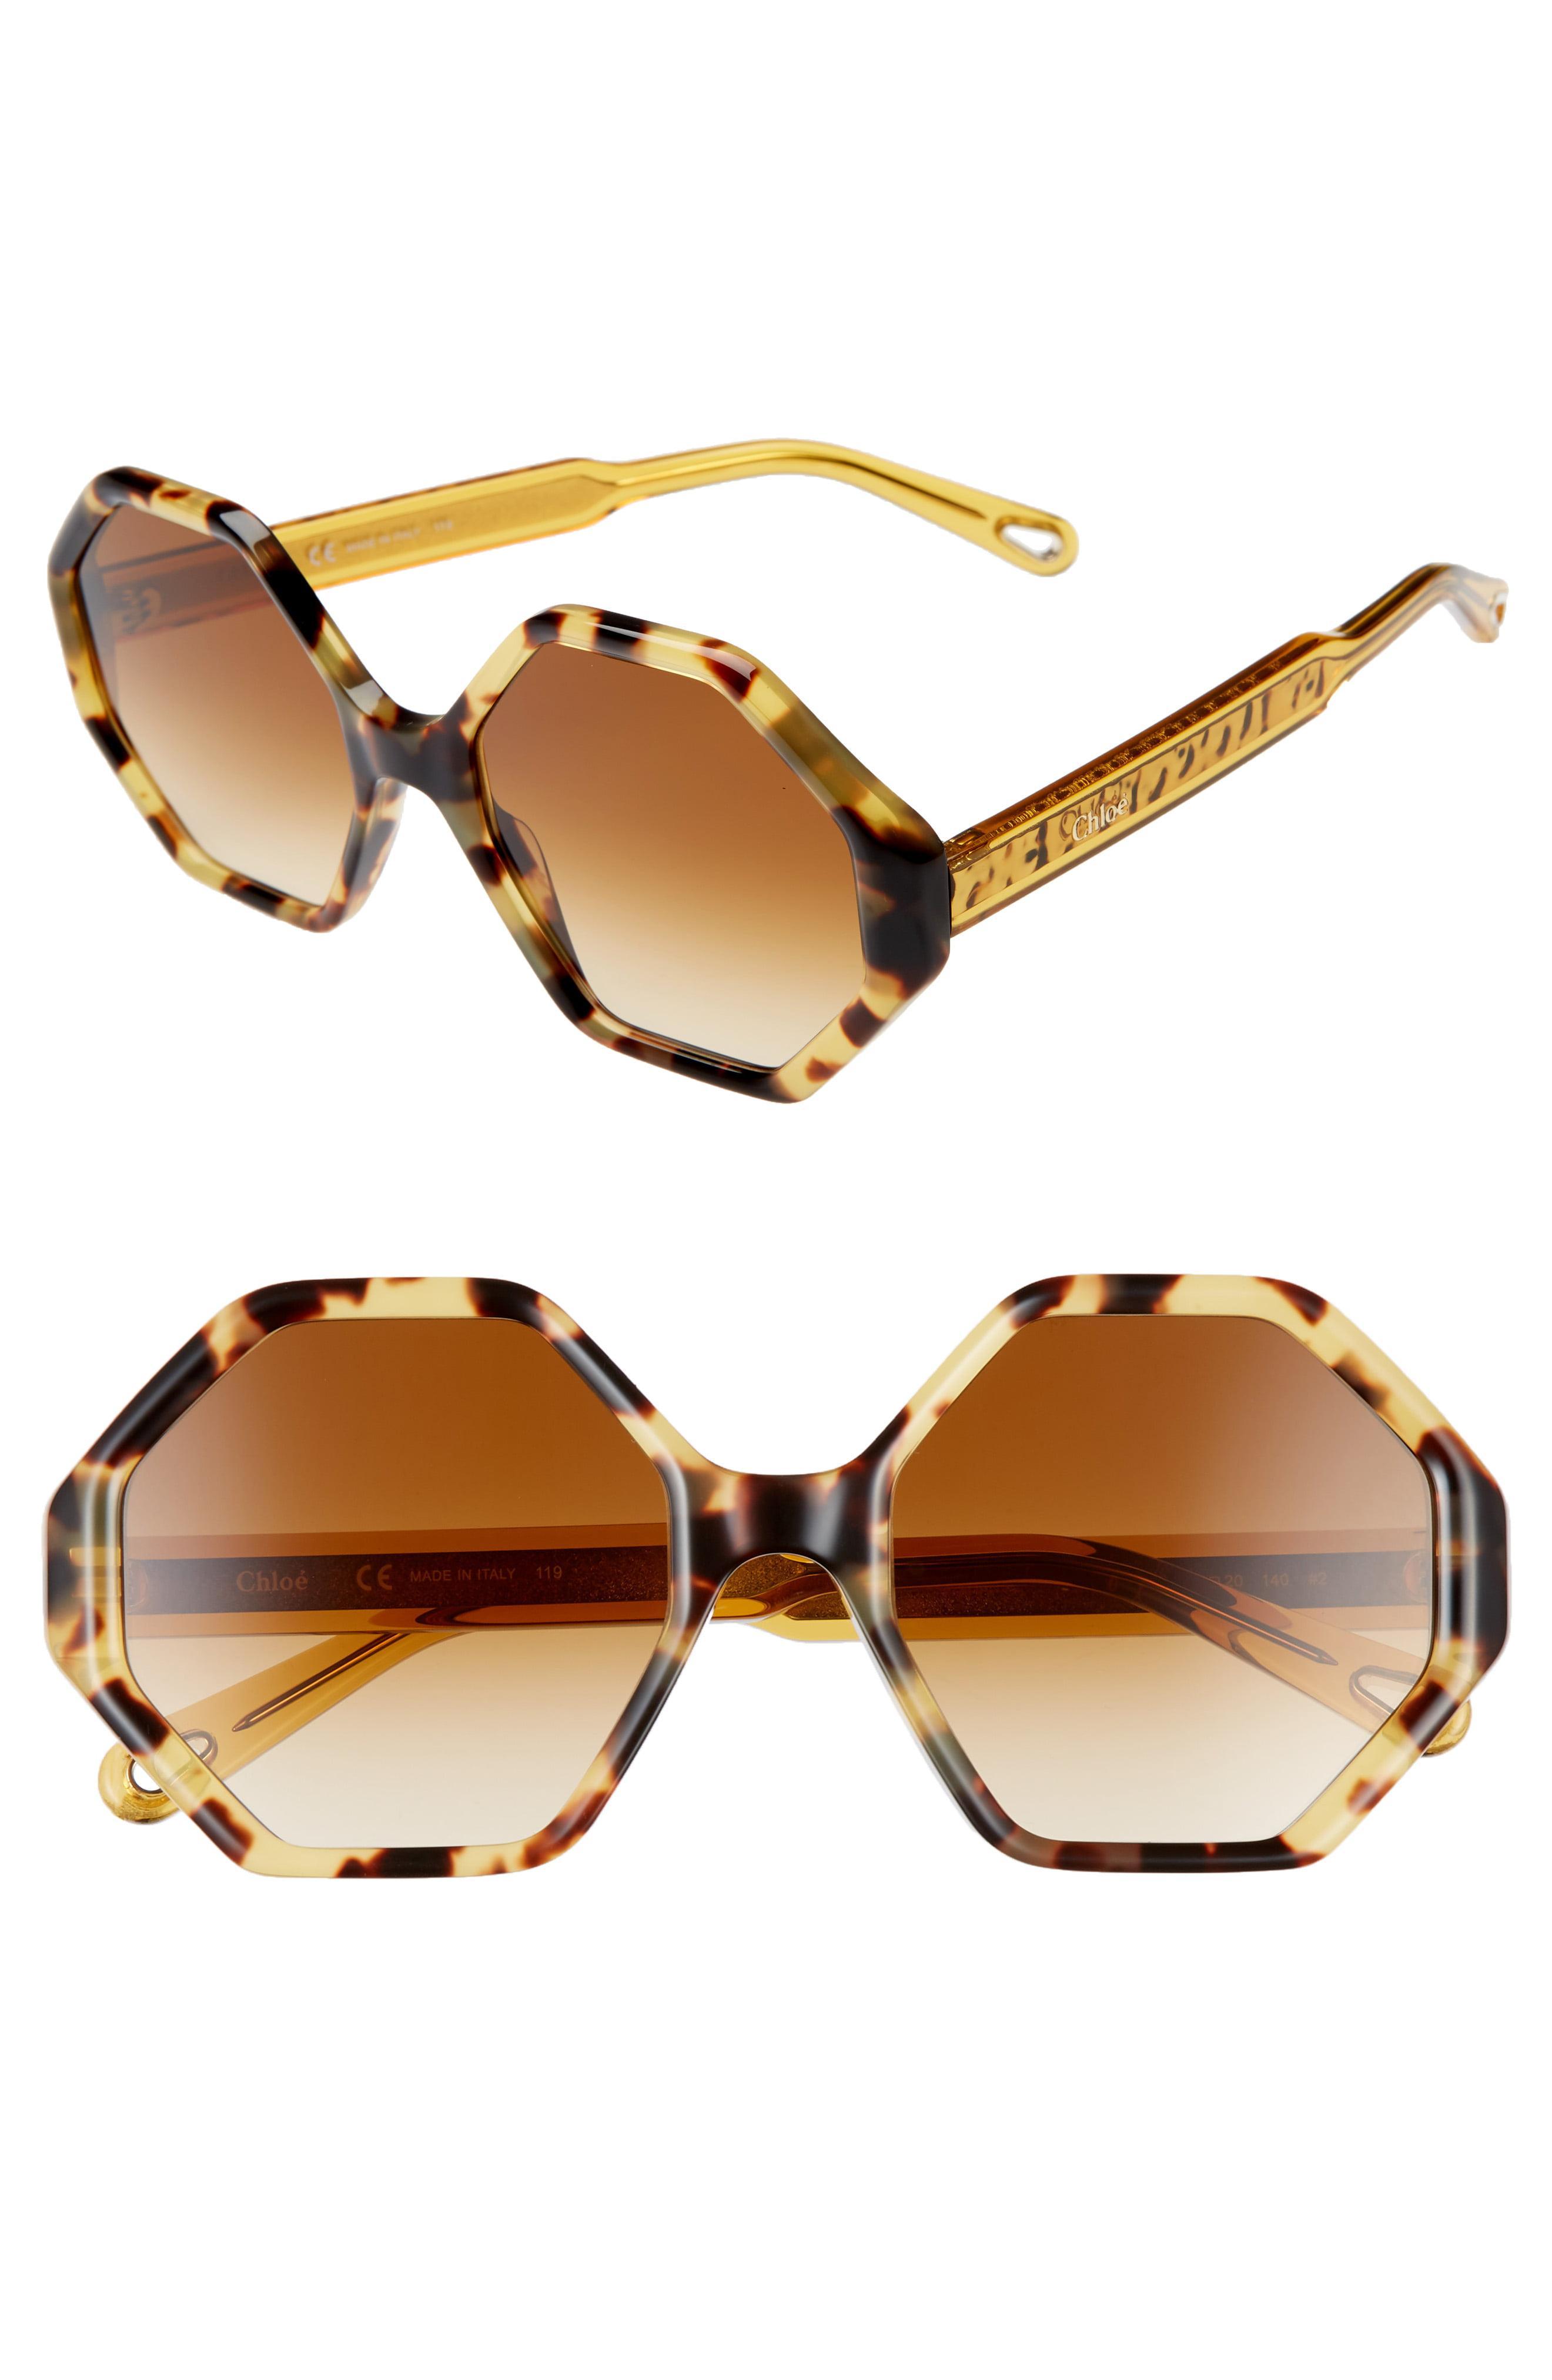 f93e3ad3d6 Lyst - Chloé Willow 55mm Octagonal Sunglasses - Havana Gradient ...